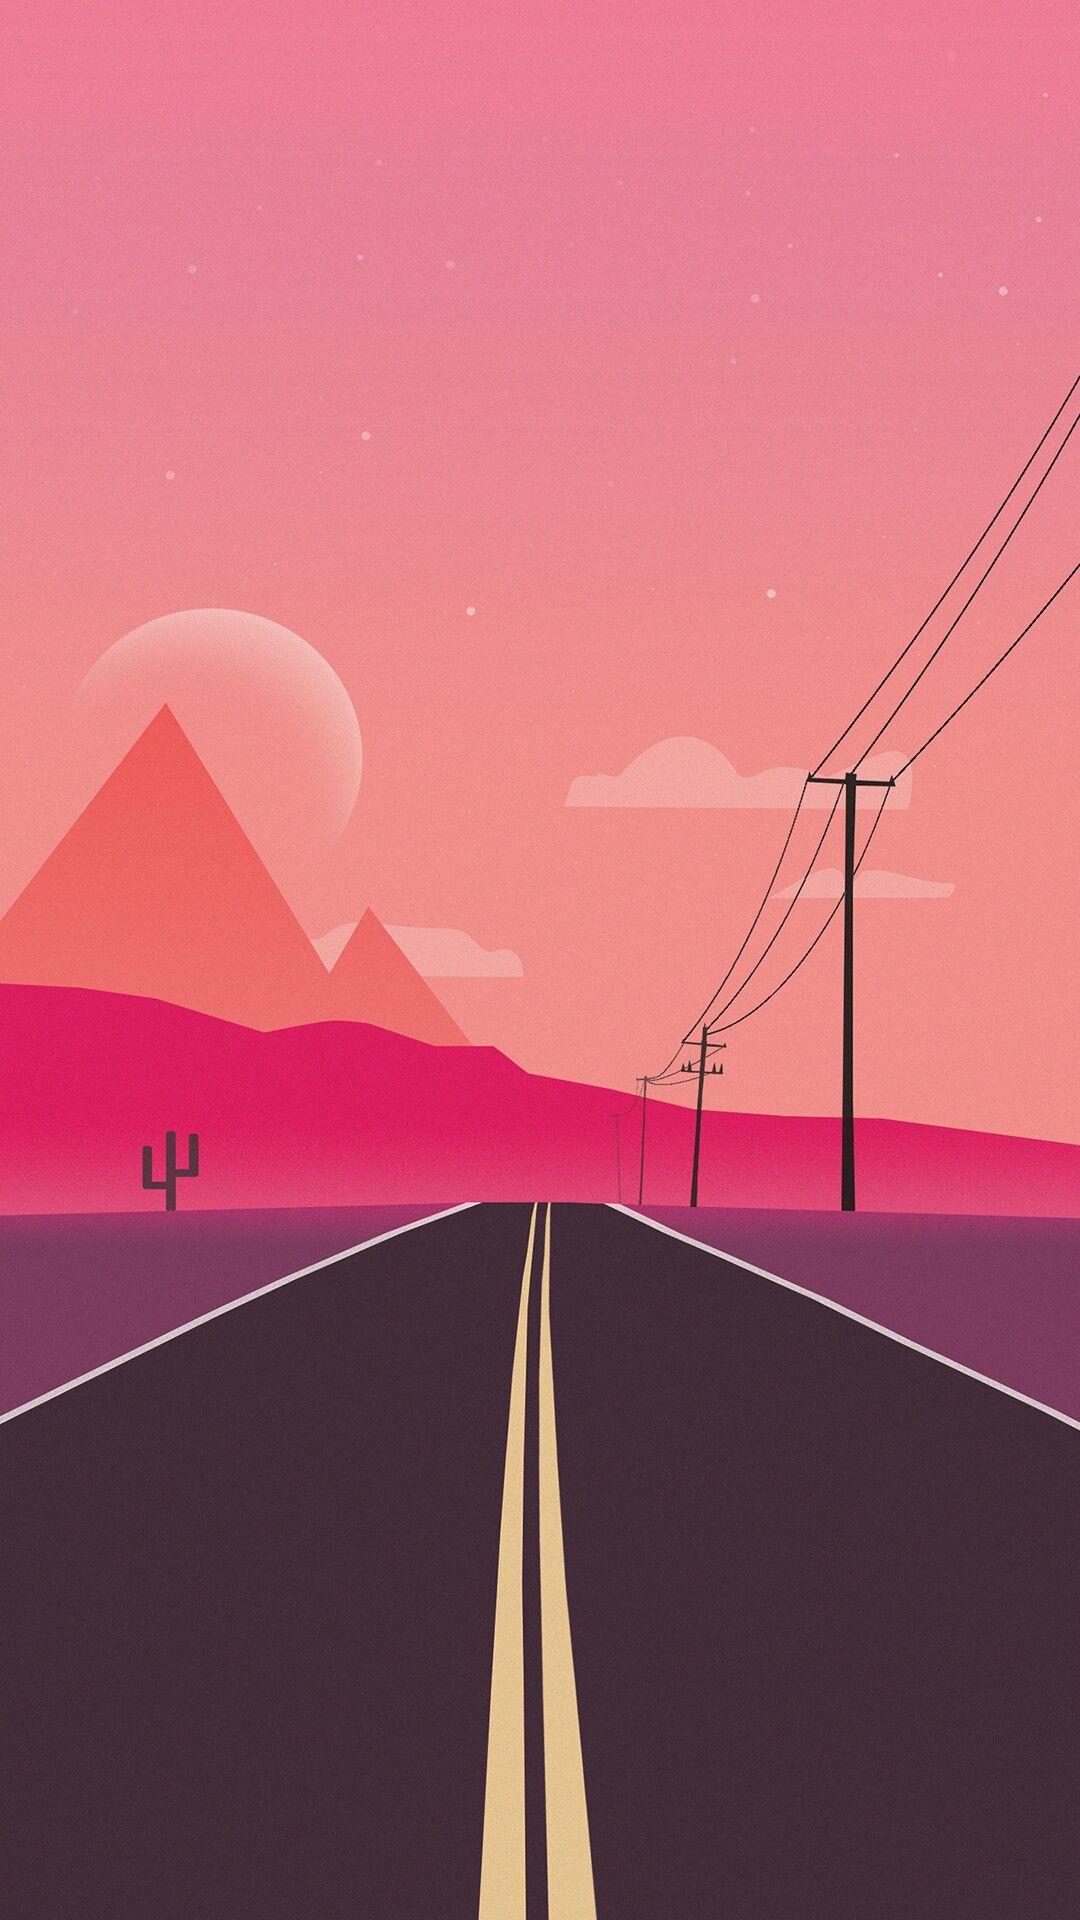 Minimal Road Mountains iPhone Wallpaper